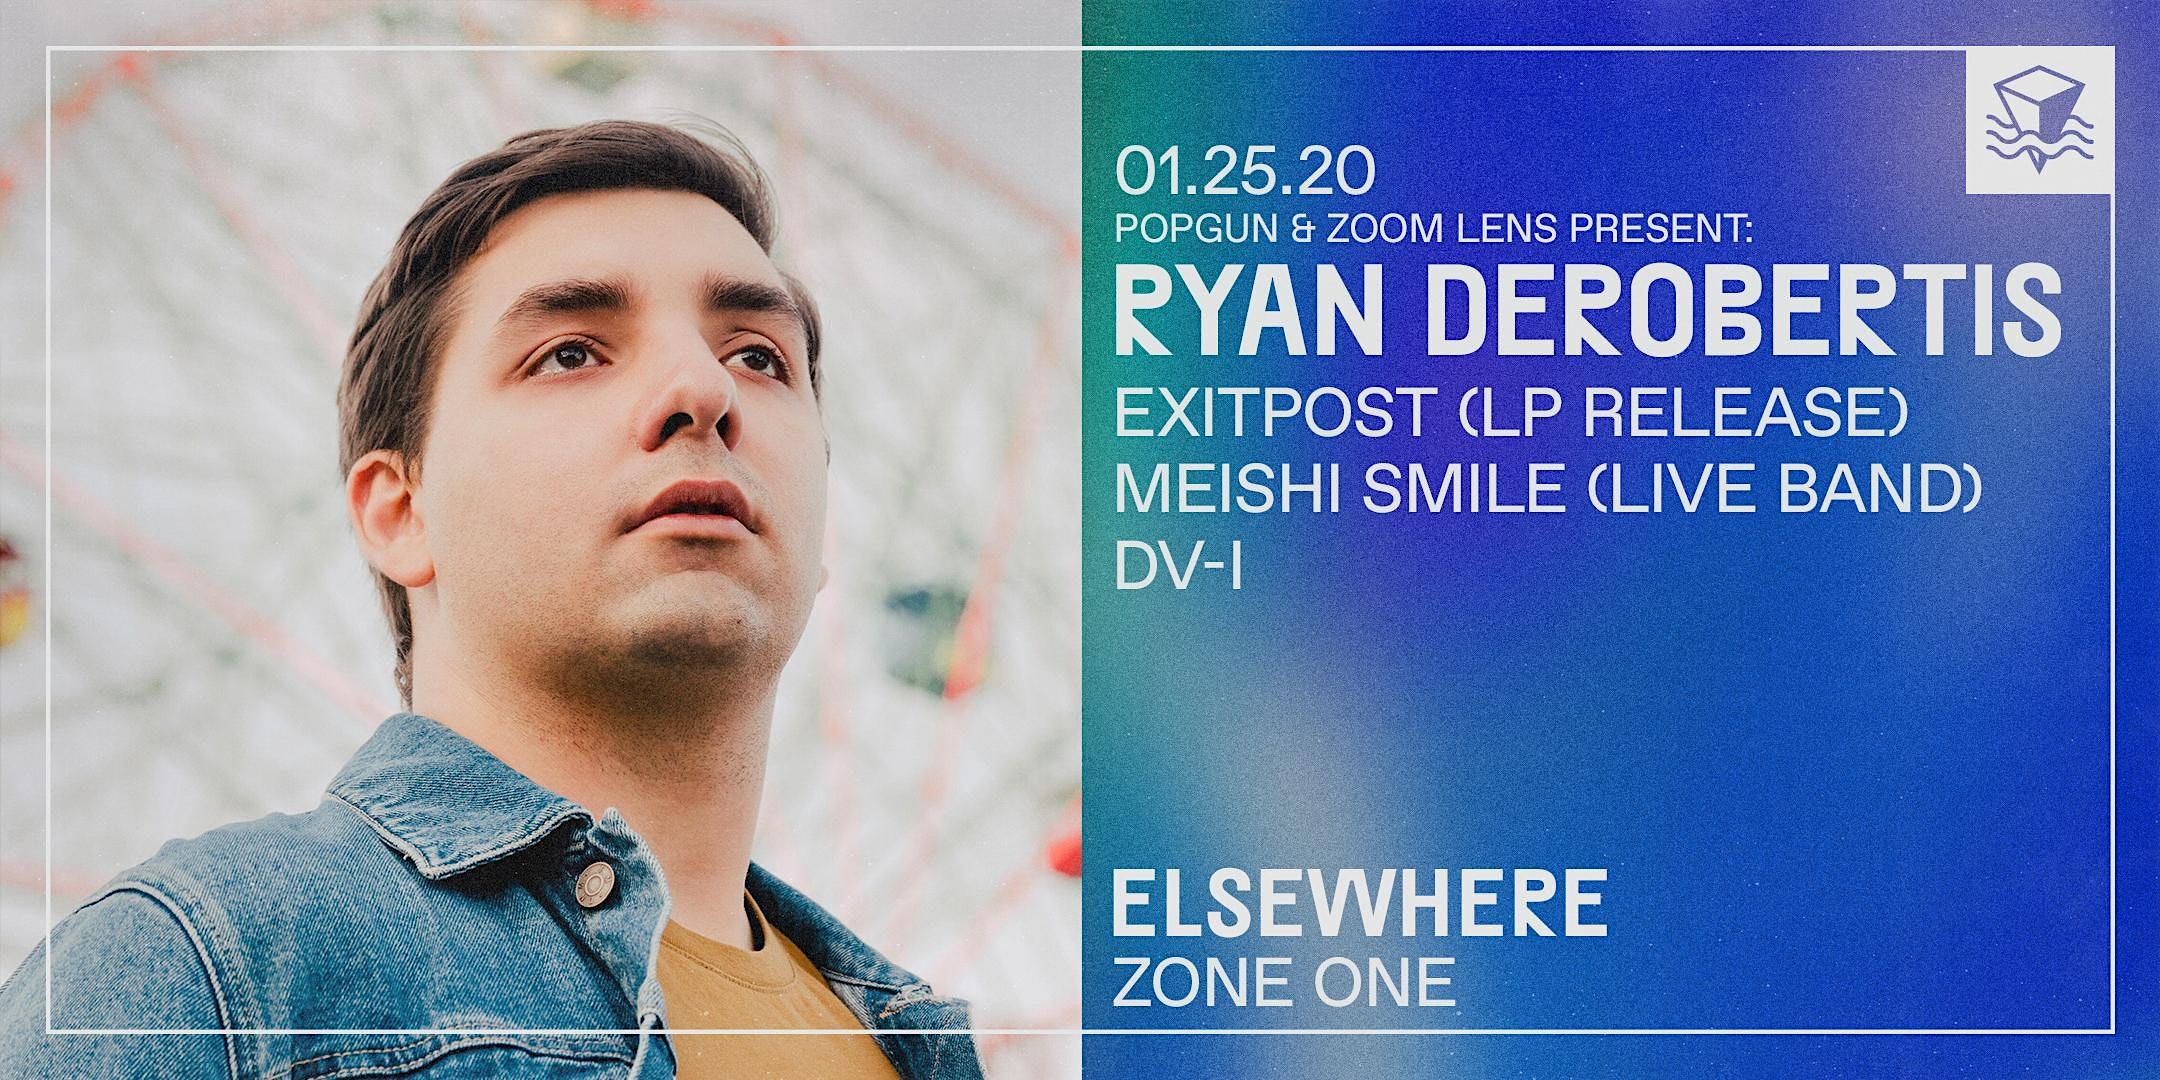 PopGun & ZOOM LENS Present: Ryan DeRobertis, Exitpost (LP Release), Meishi Smile (Live Band) & DV-i